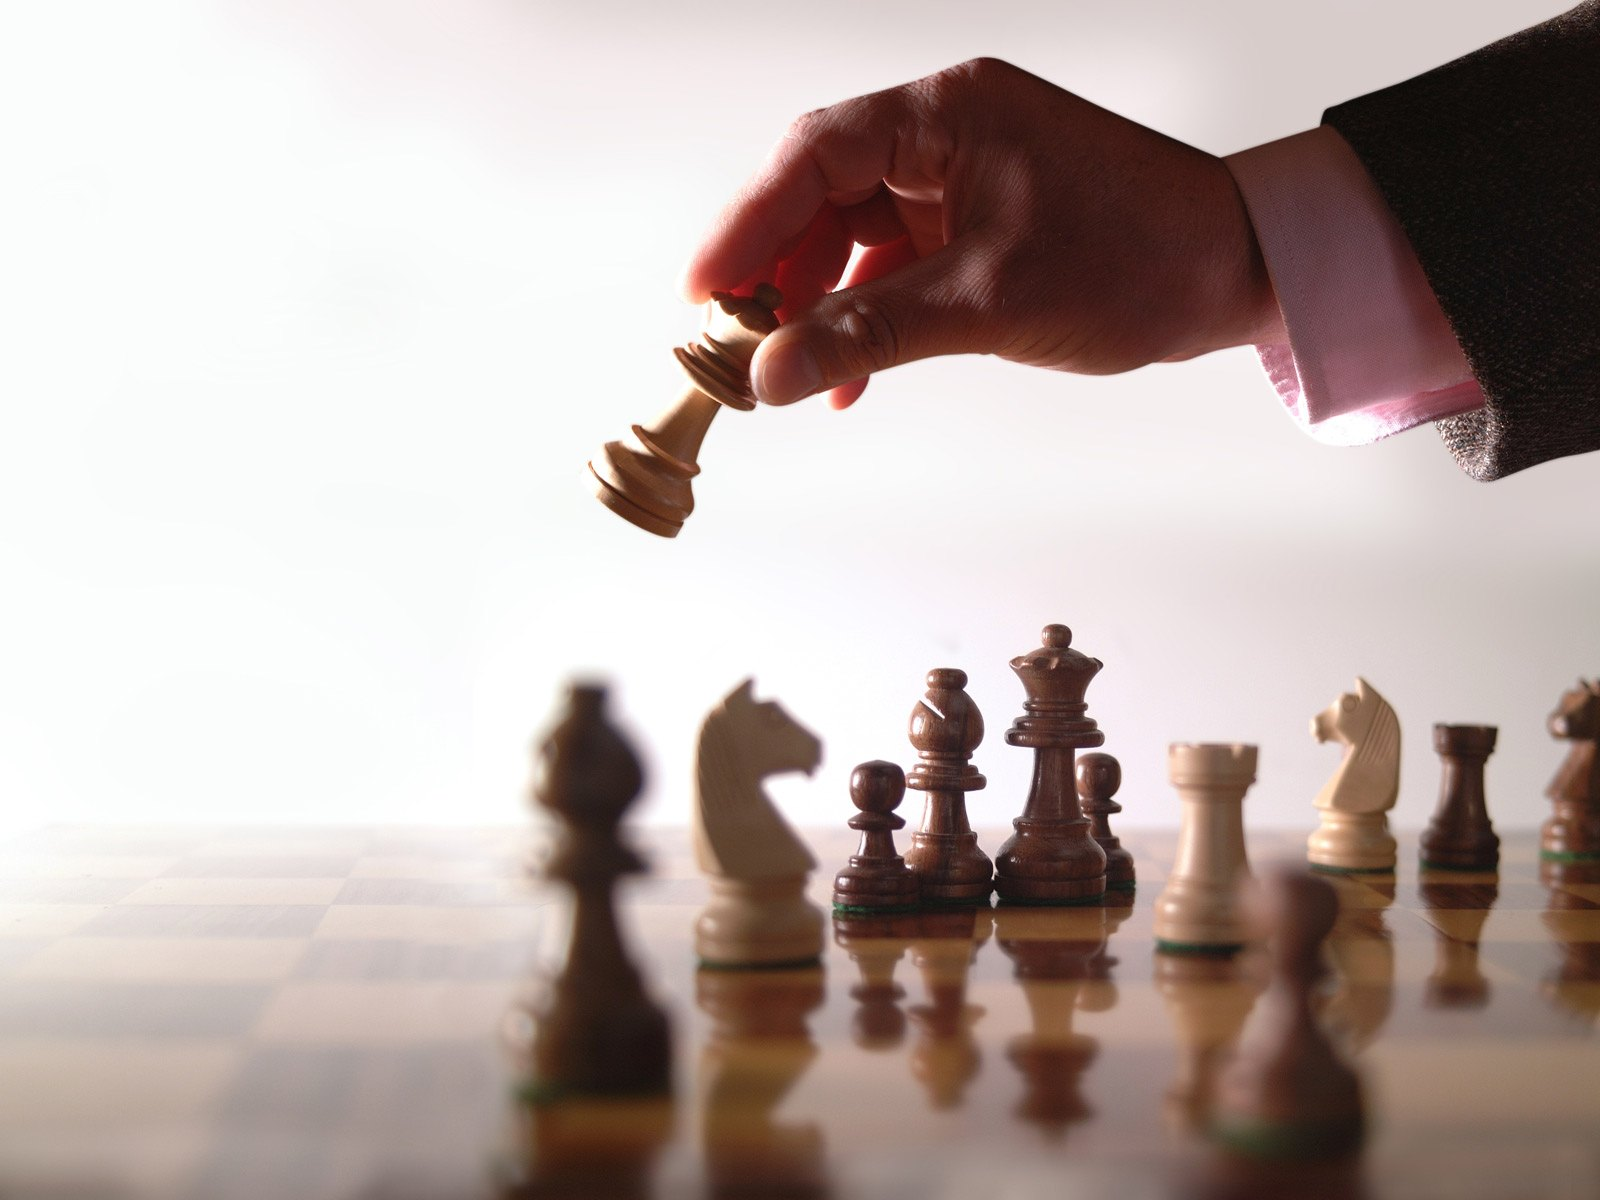 jogada-no-xadrez